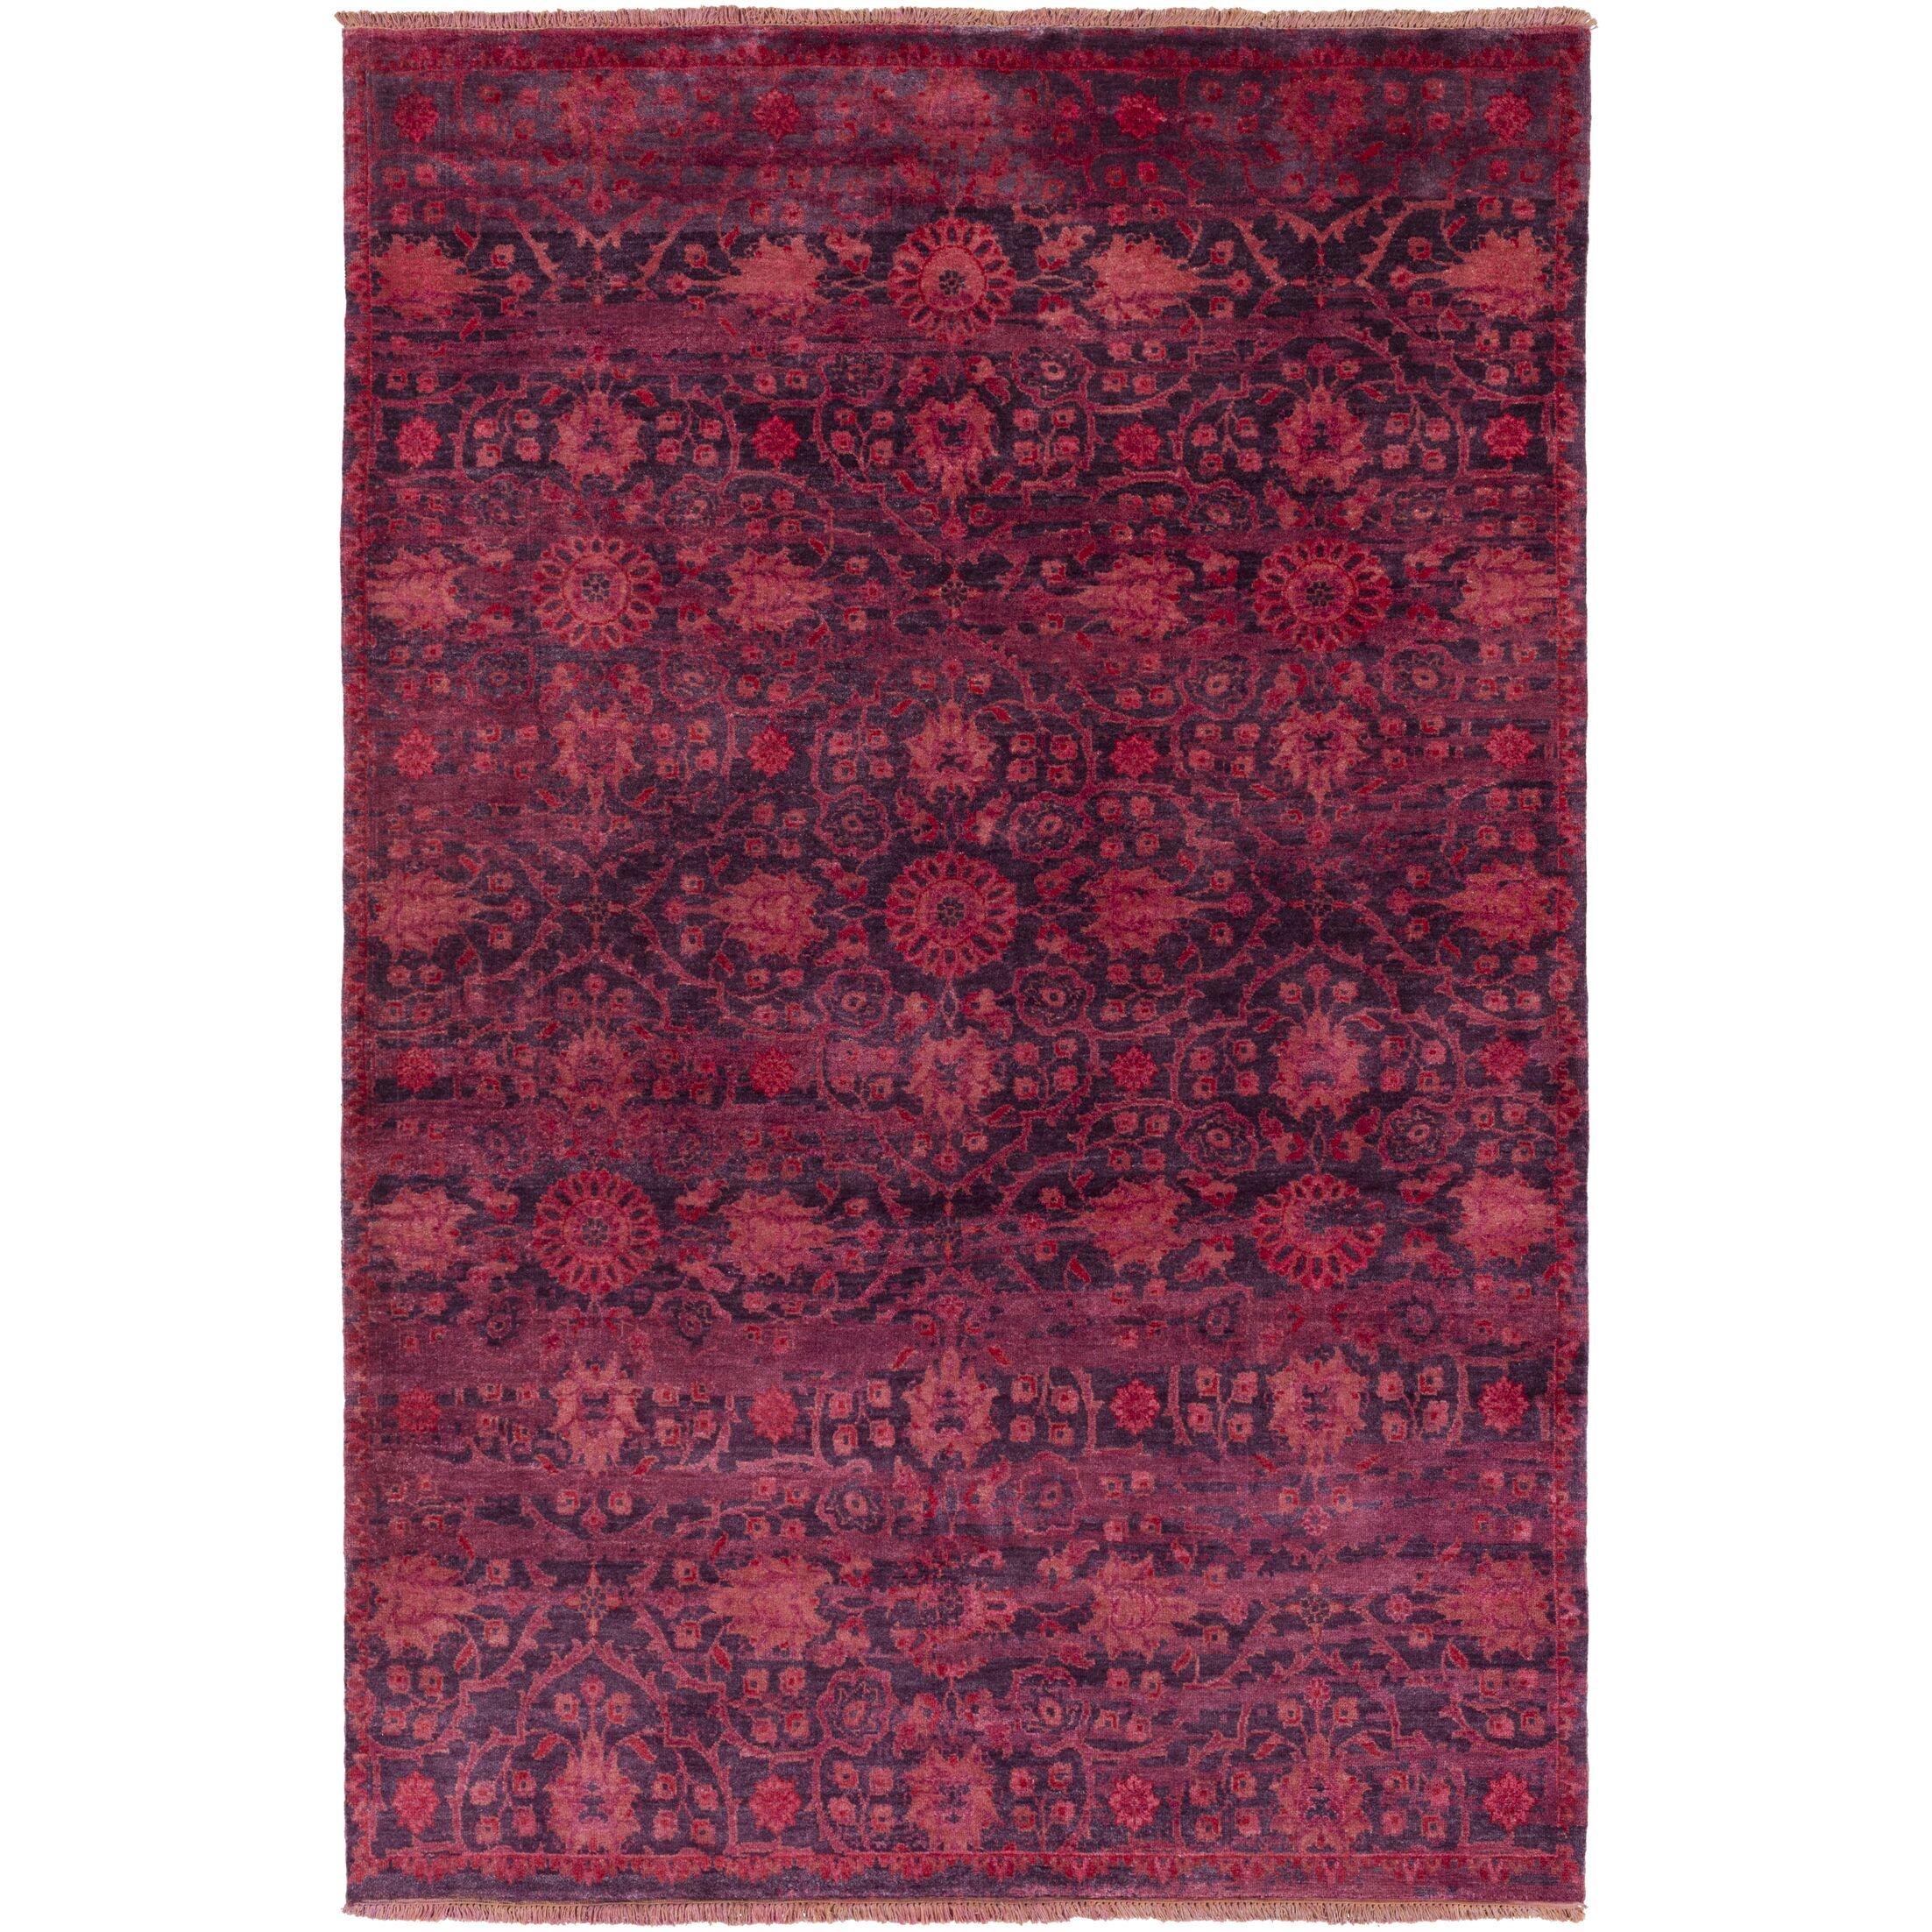 Halima Hand-Knotted Burgundy Area Rug Rug Size: Rectangle 5'6